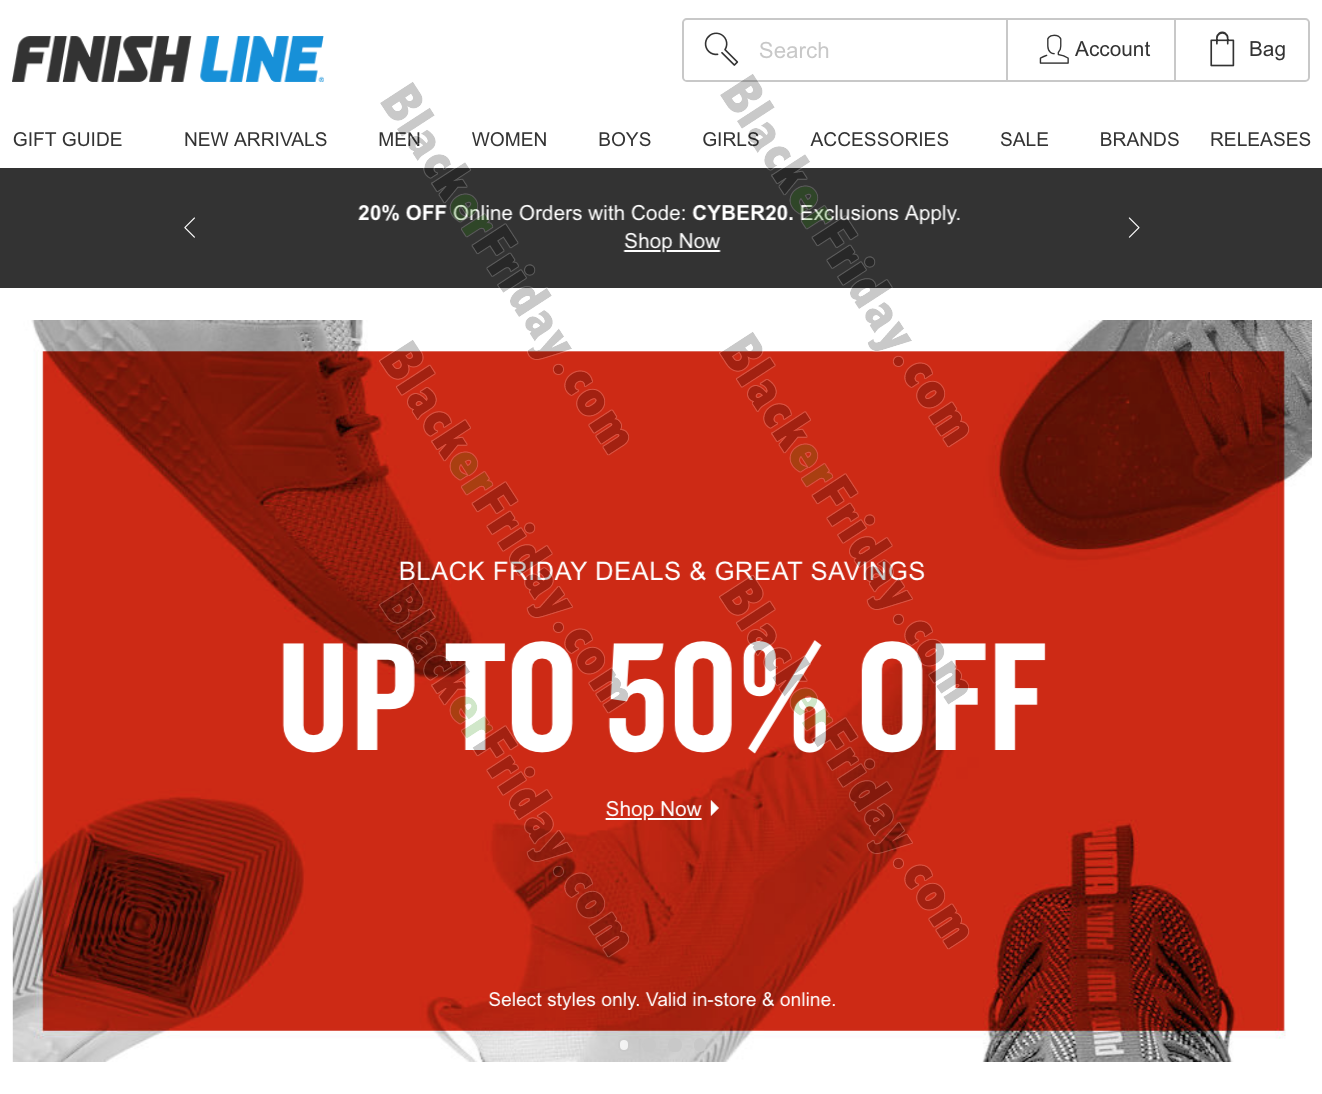 Finish Line Black Friday 2020 Sale